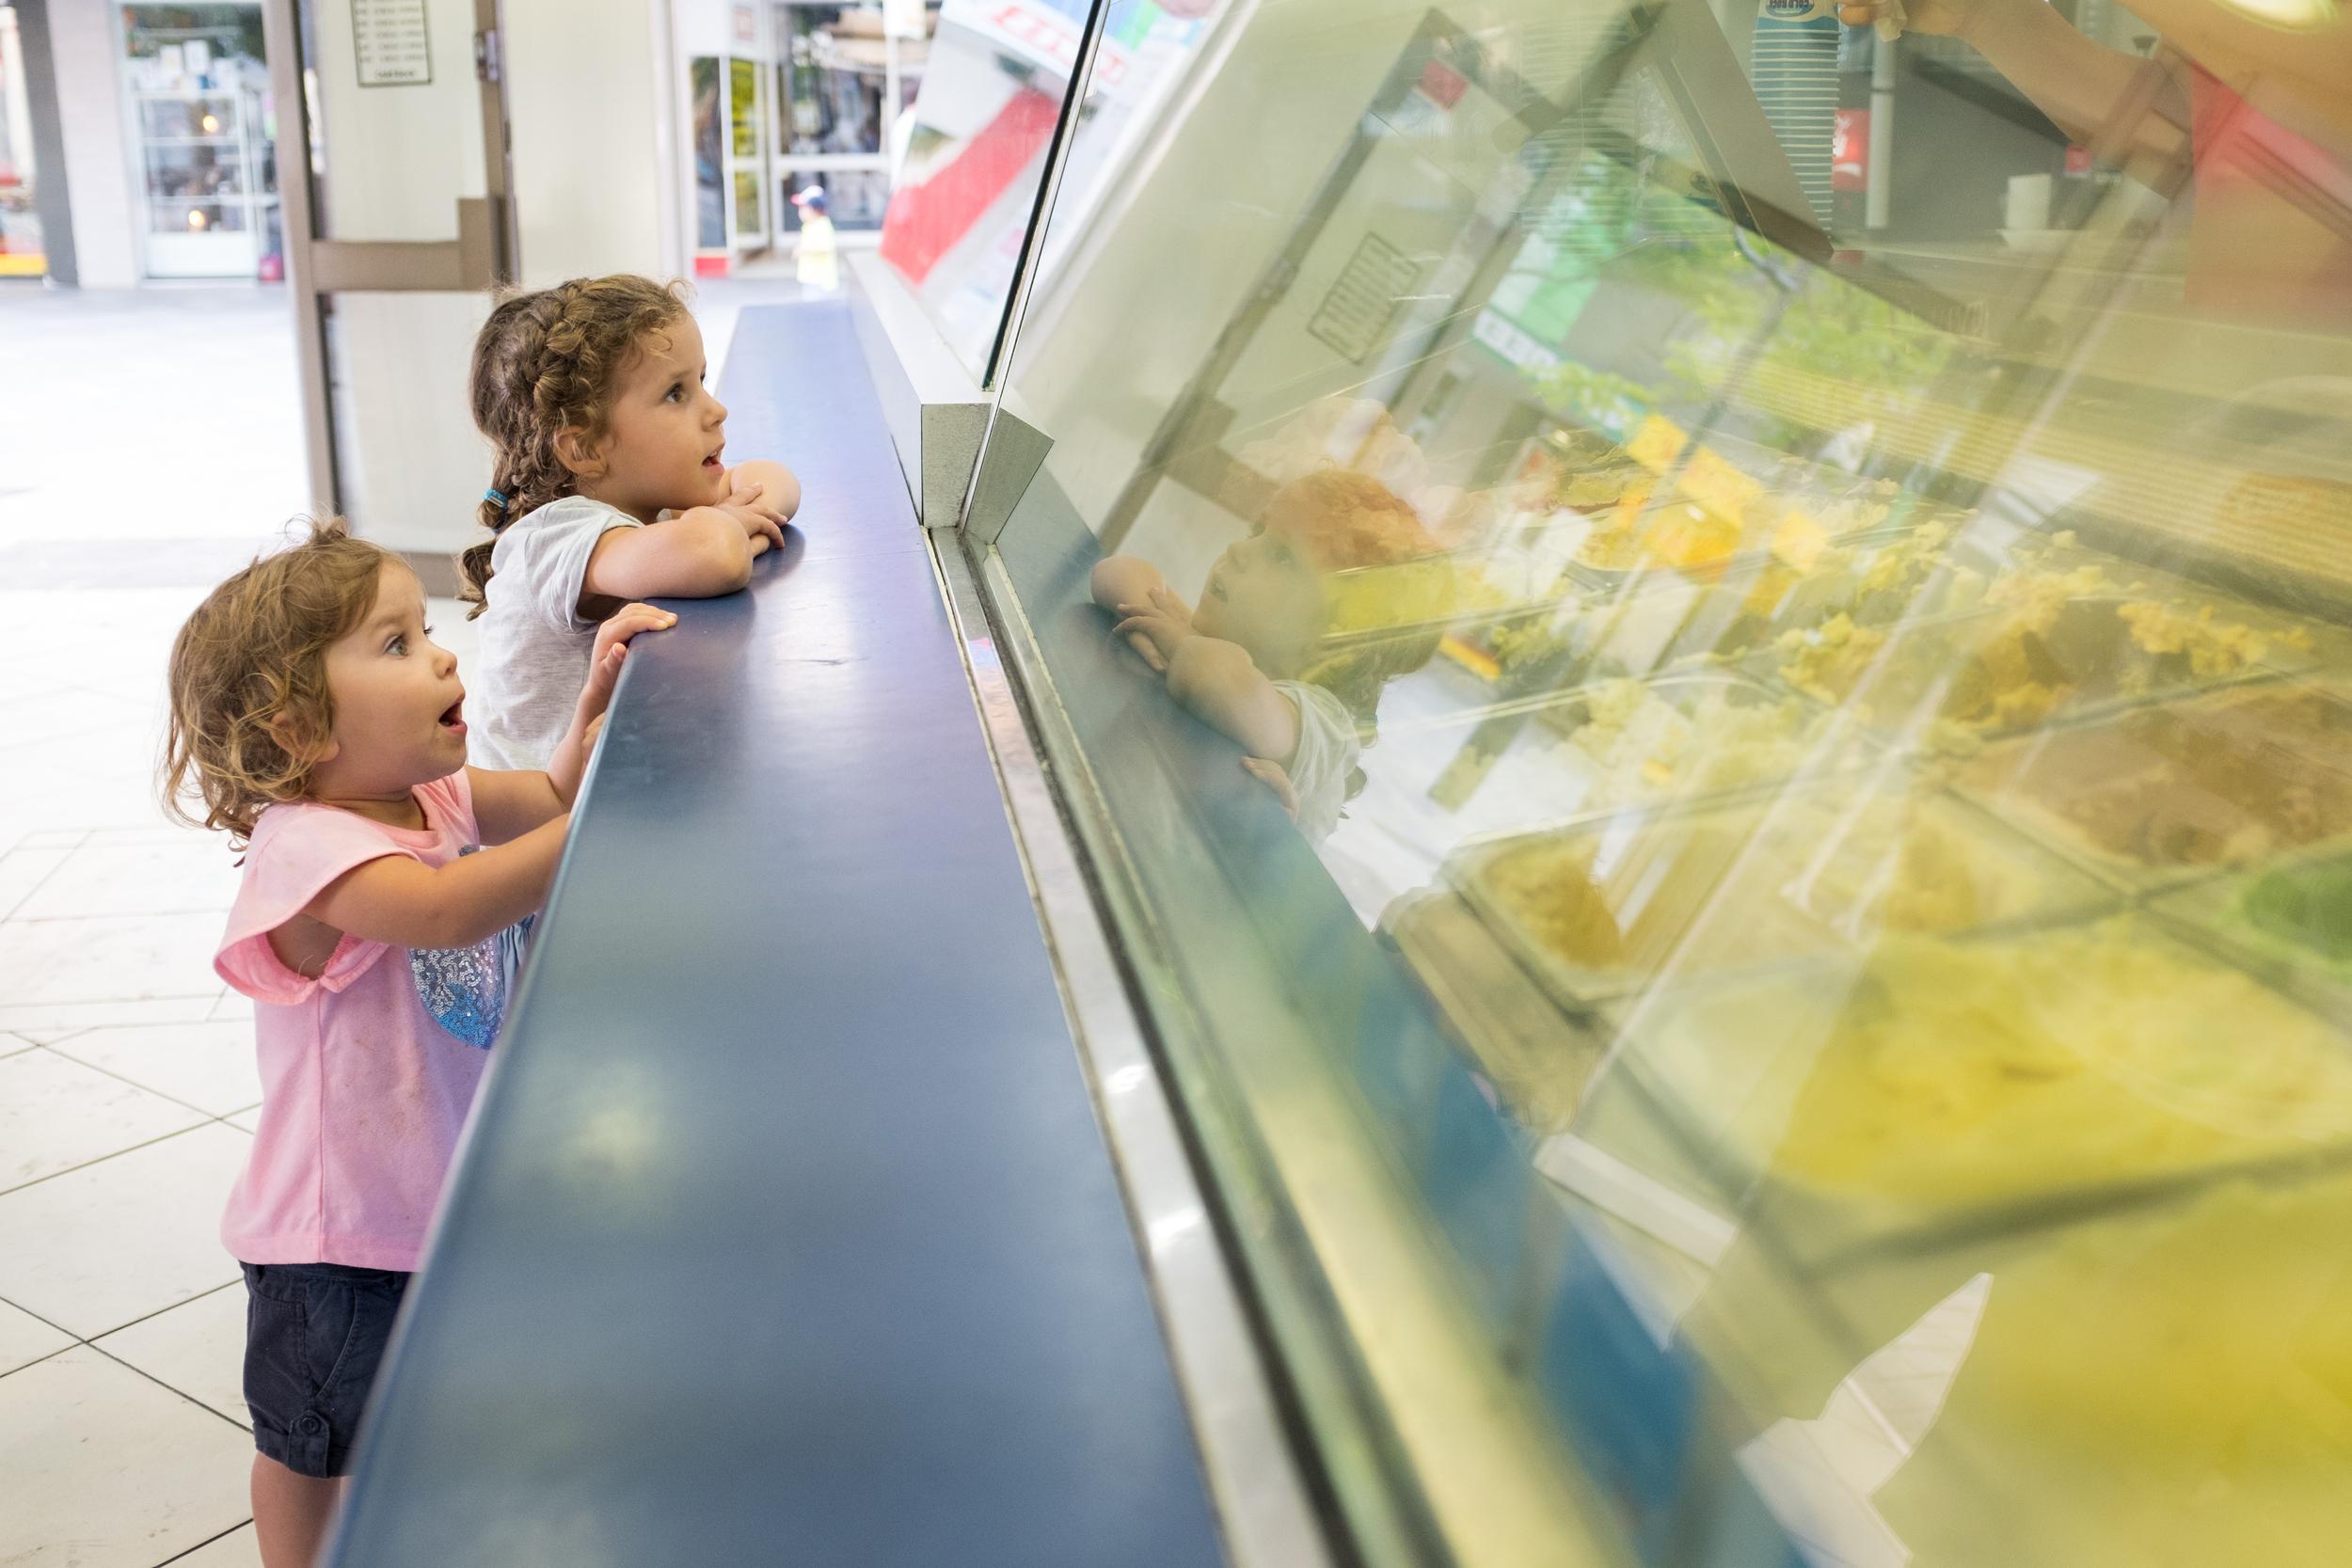 Post dinner icecreams in Cronulla on a hot evening.